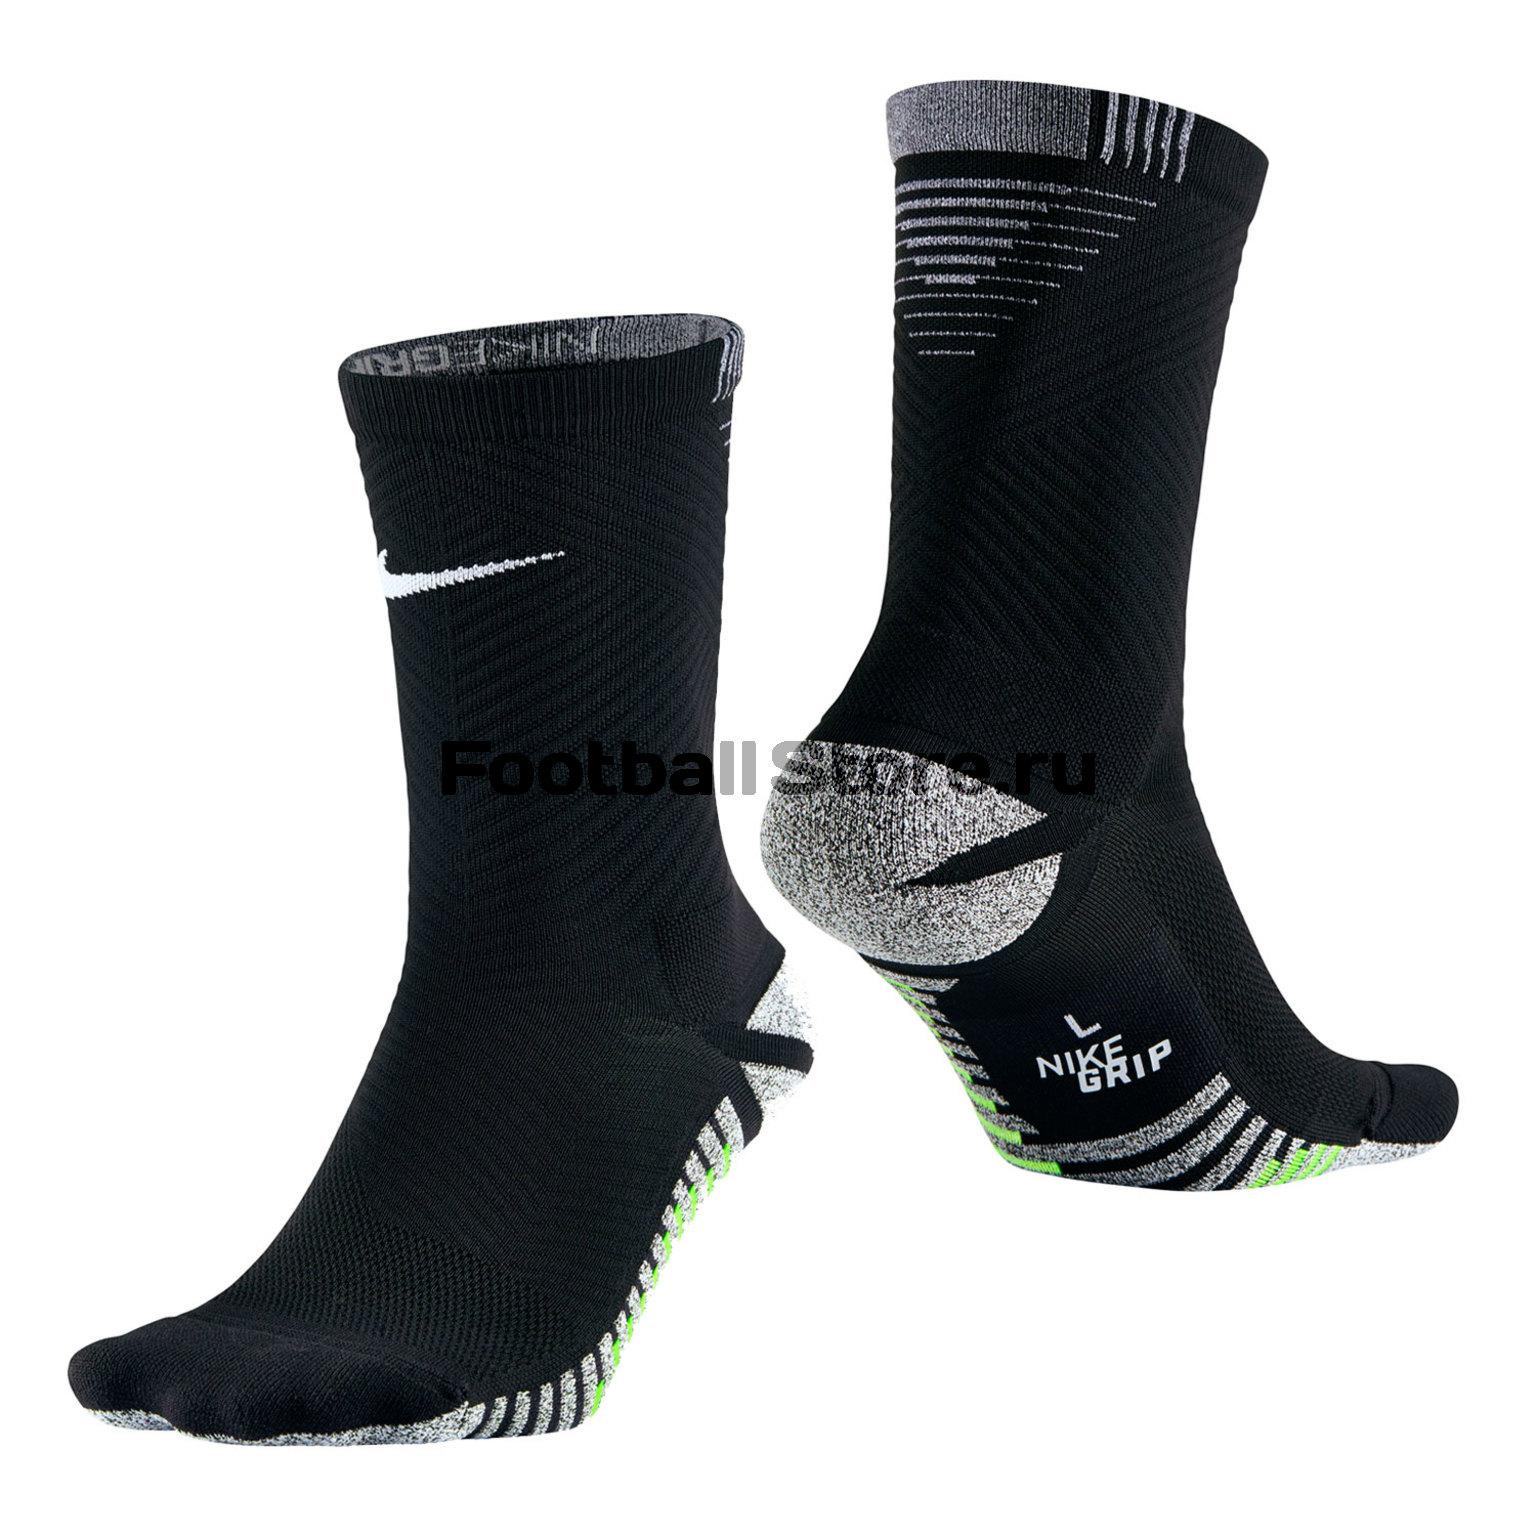 Носки Nike Носки Nike Grip Strike Light Crew SX5486-015 носки nike носки nike grip strike lightweight sx5089 525